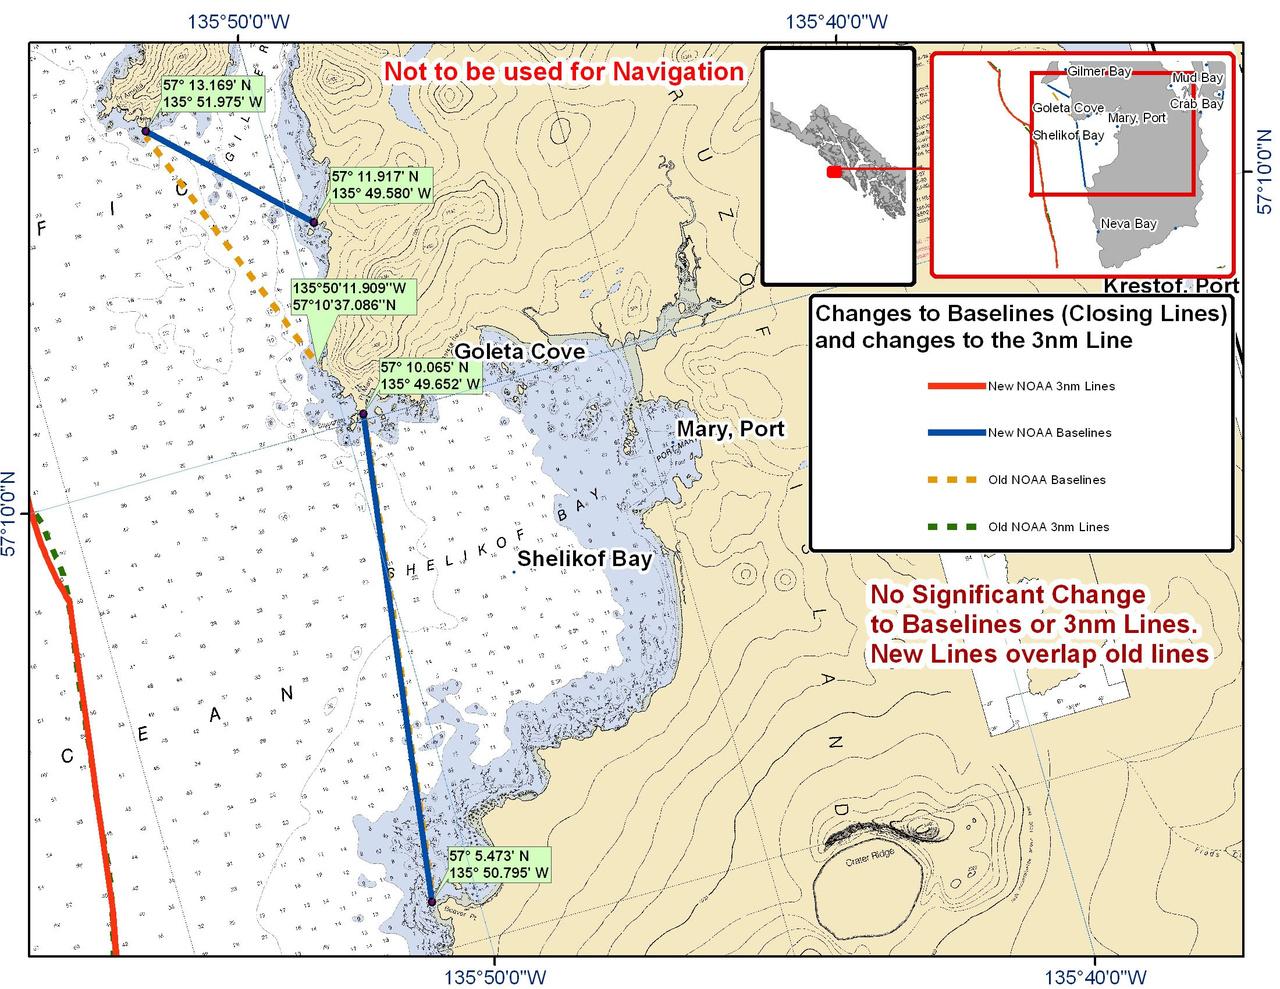 Chart for Shelikof Bay